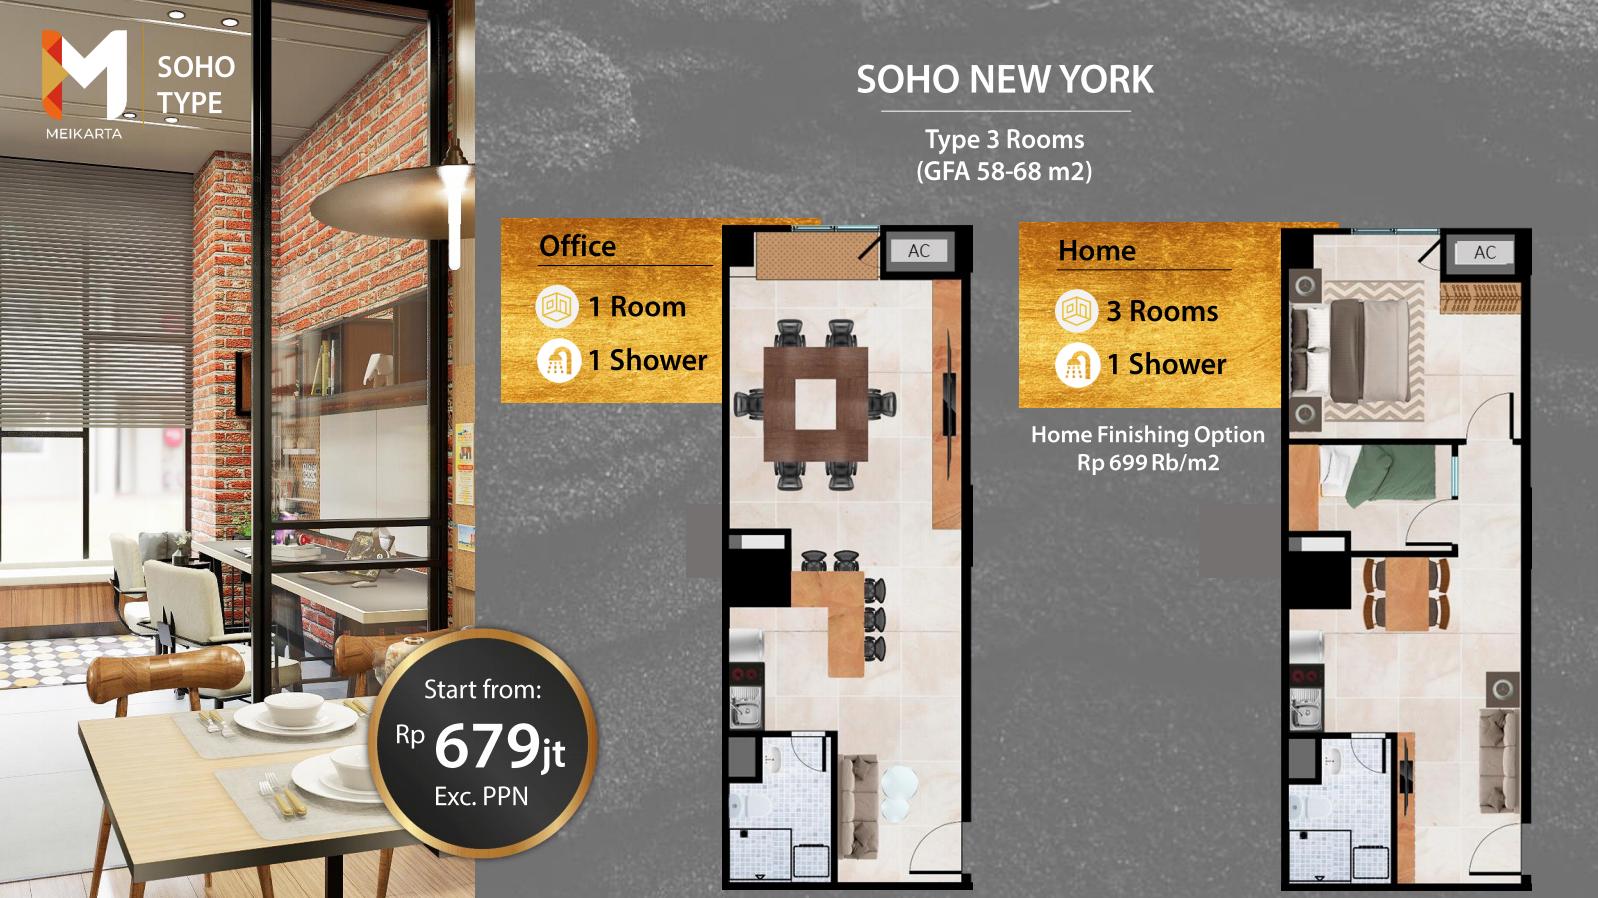 denah unit soho new york apartemen meikarta cikarang - kadungcampur